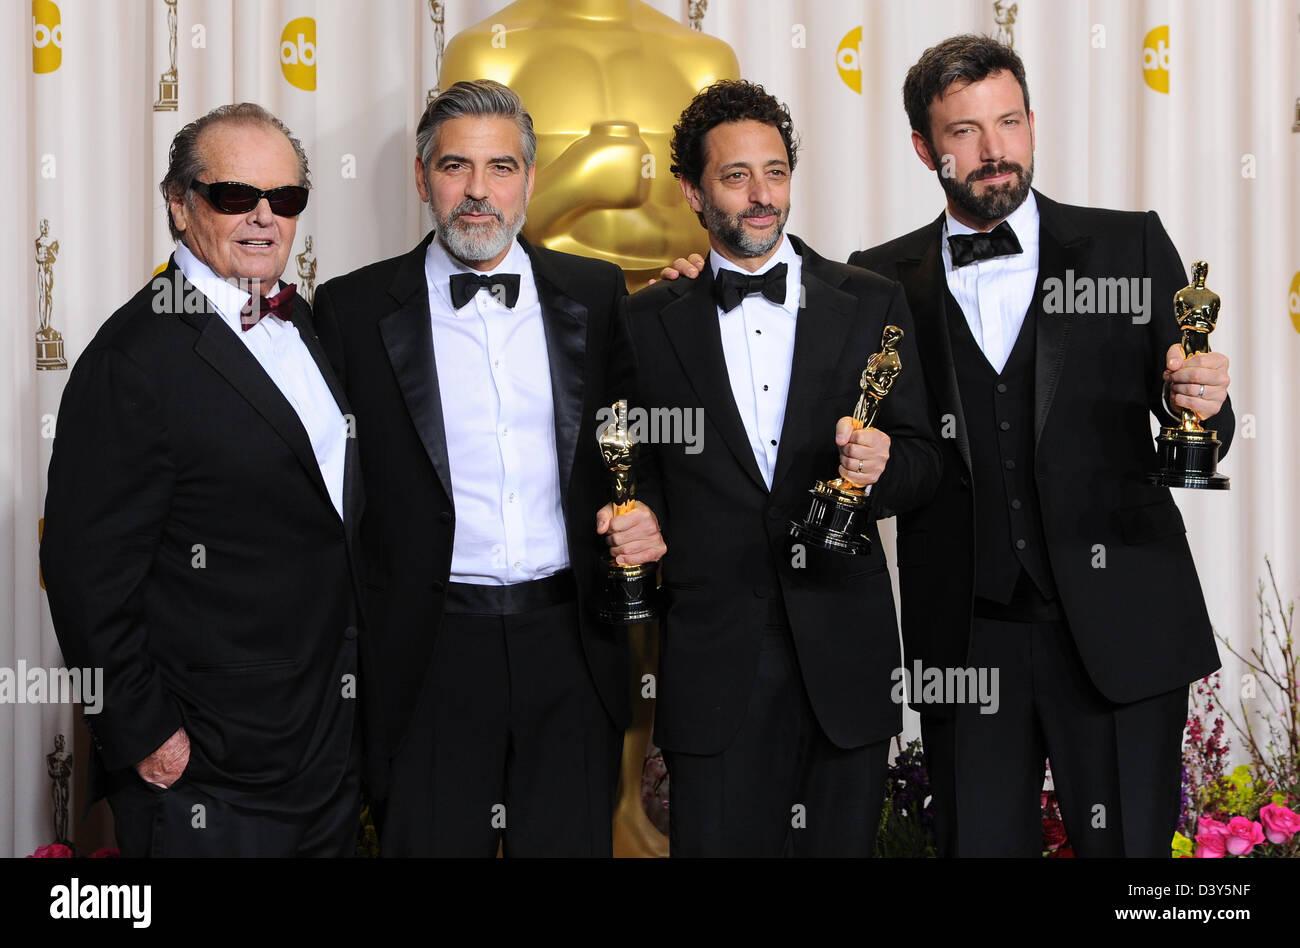 Los Angeles, USA. 24 février 2013. Jack Nicholson, George Clooney, Grant Heslov et Ben Affleck dans la salle Photo Stock